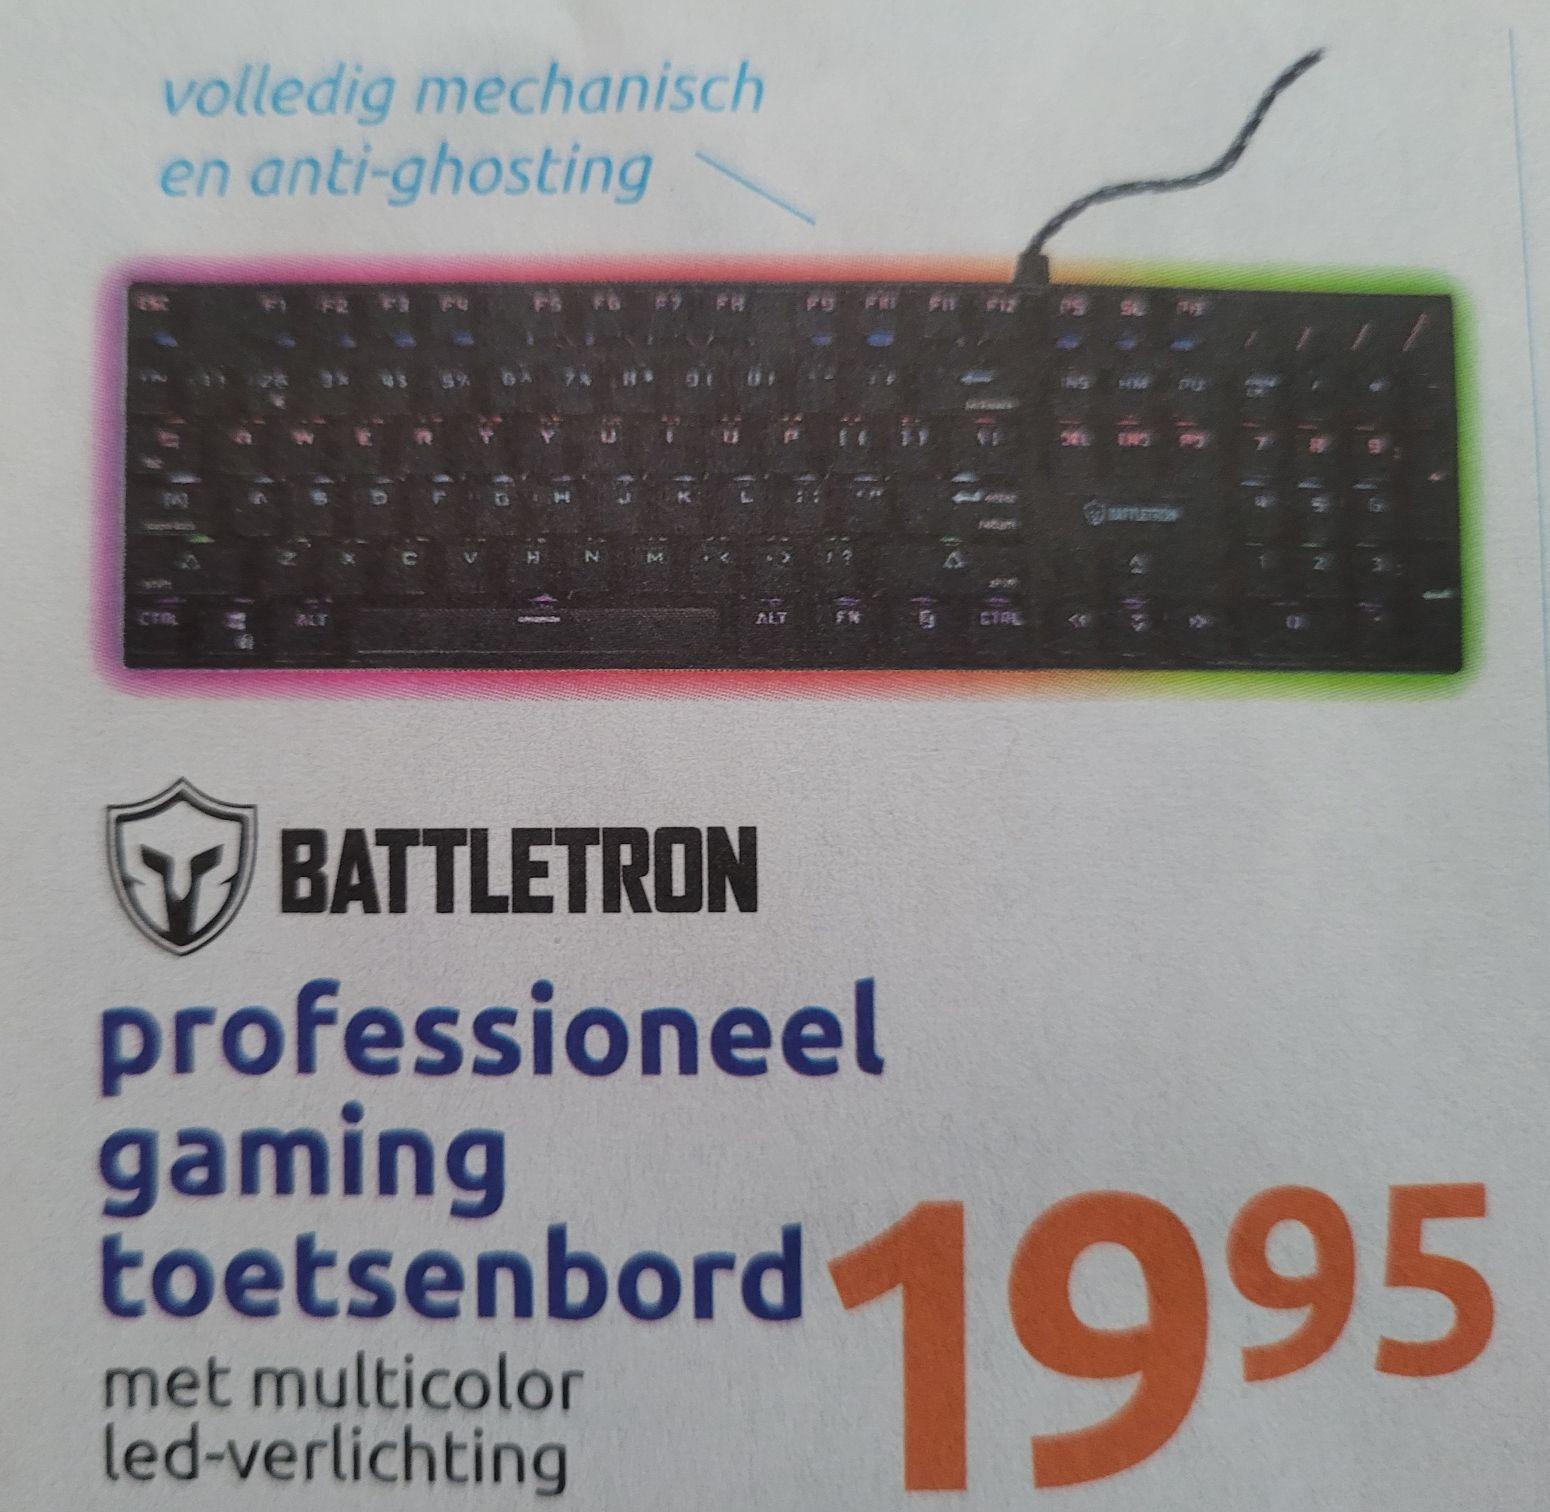 Action Battletron mechanische toetsenbord